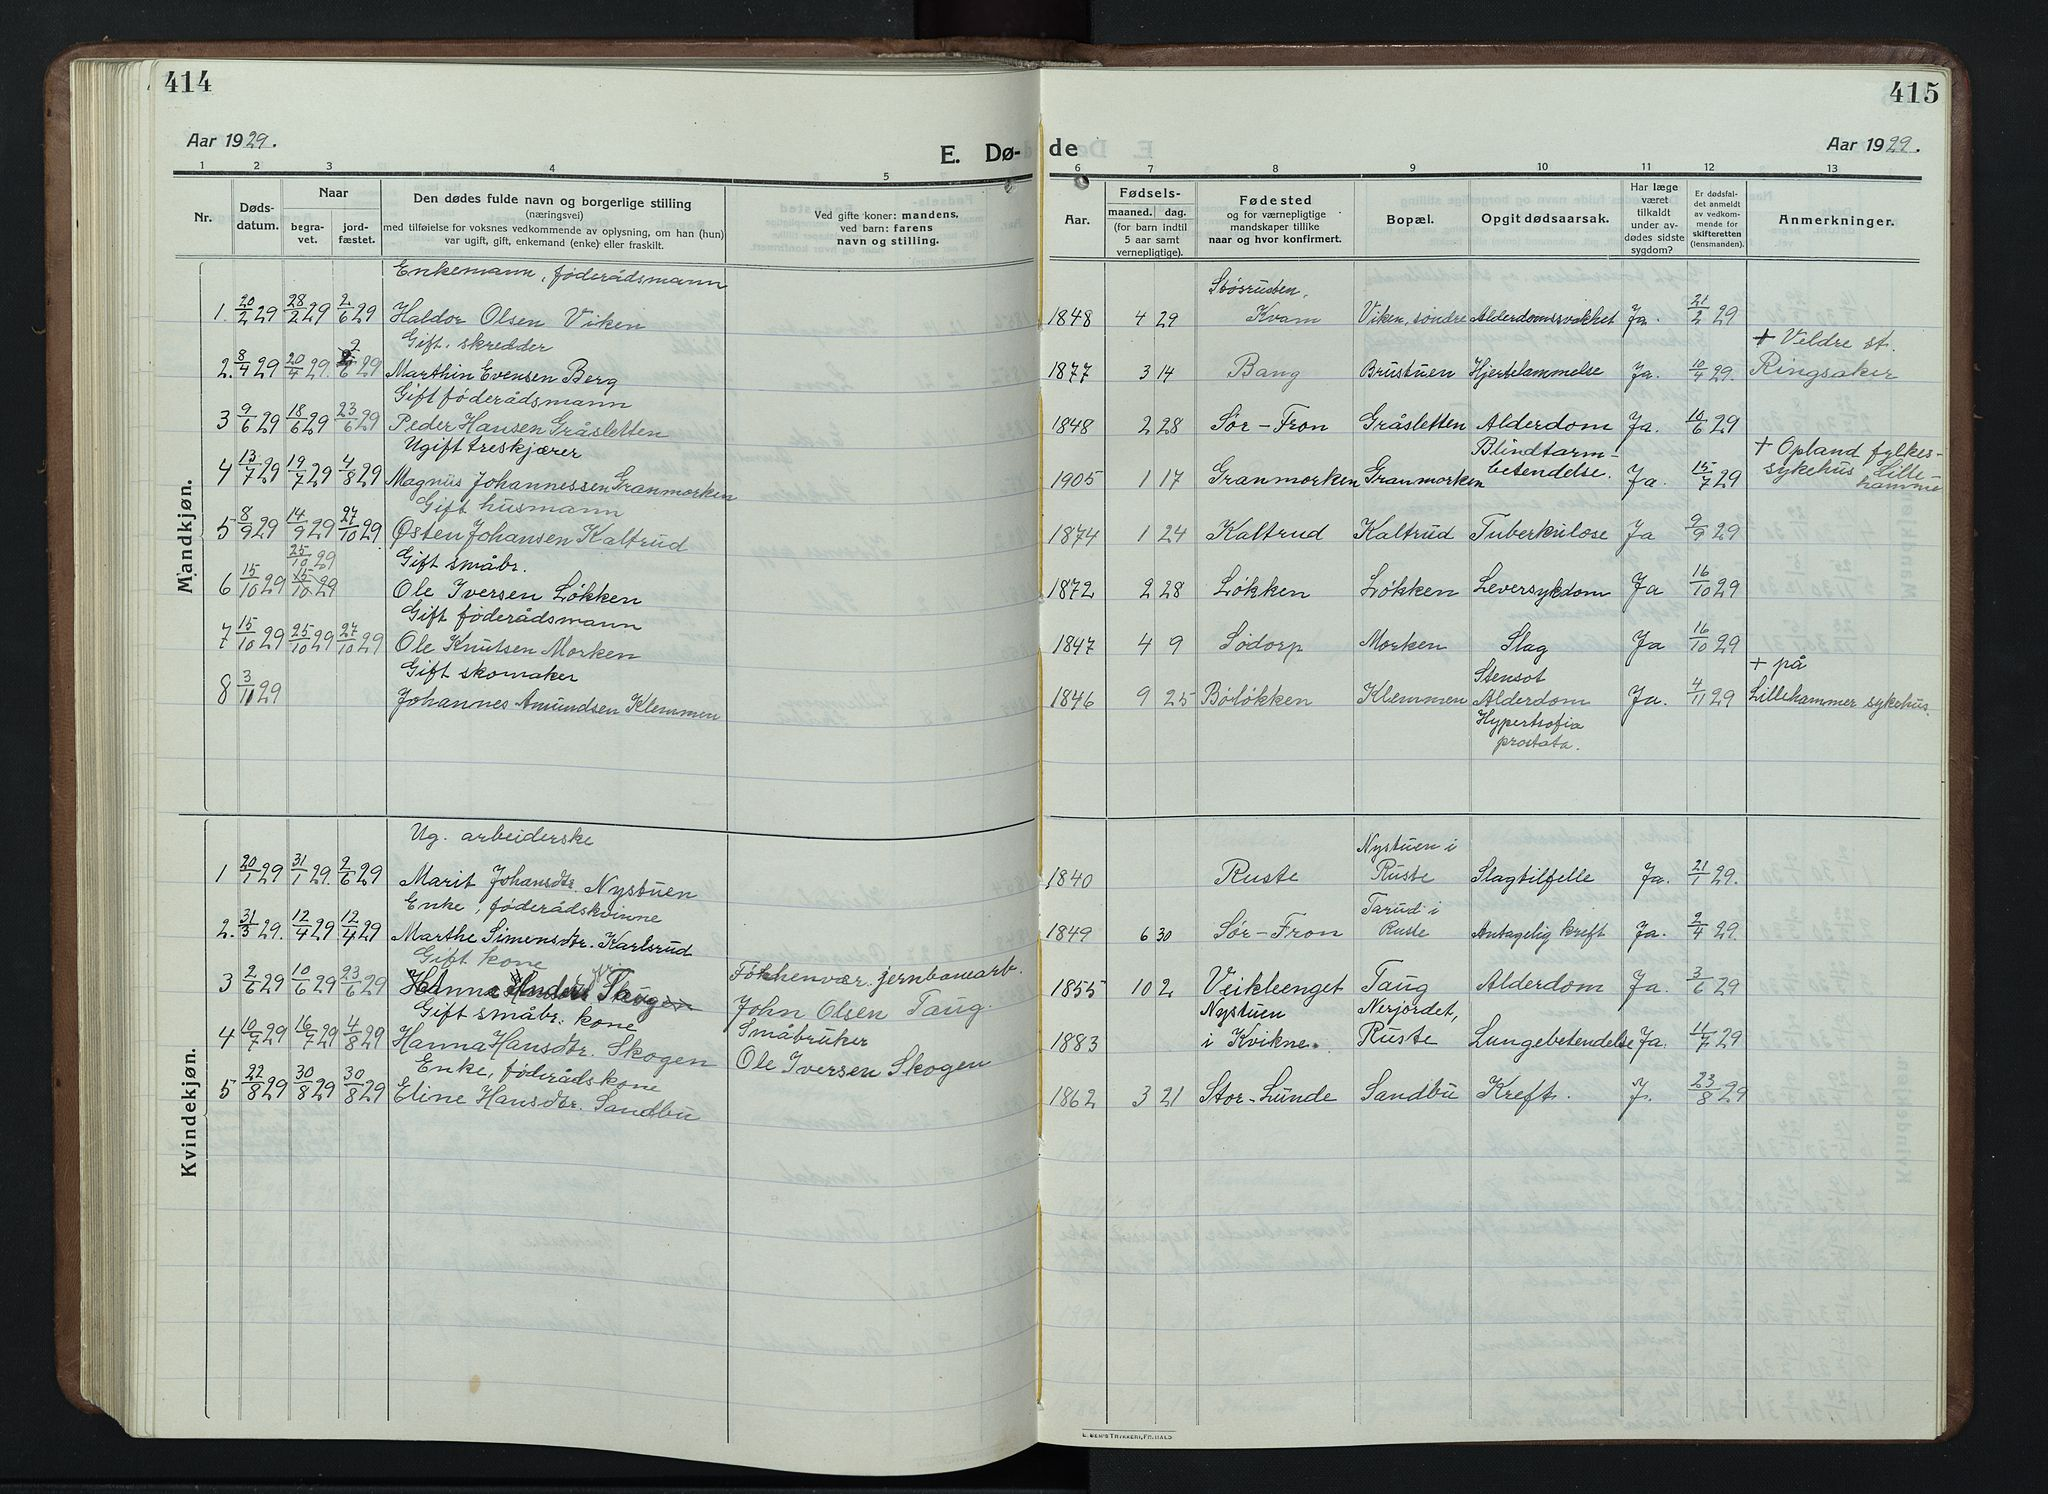 SAH, Nord-Fron prestekontor, Klokkerbok nr. 7, 1915-1946, s. 414-415